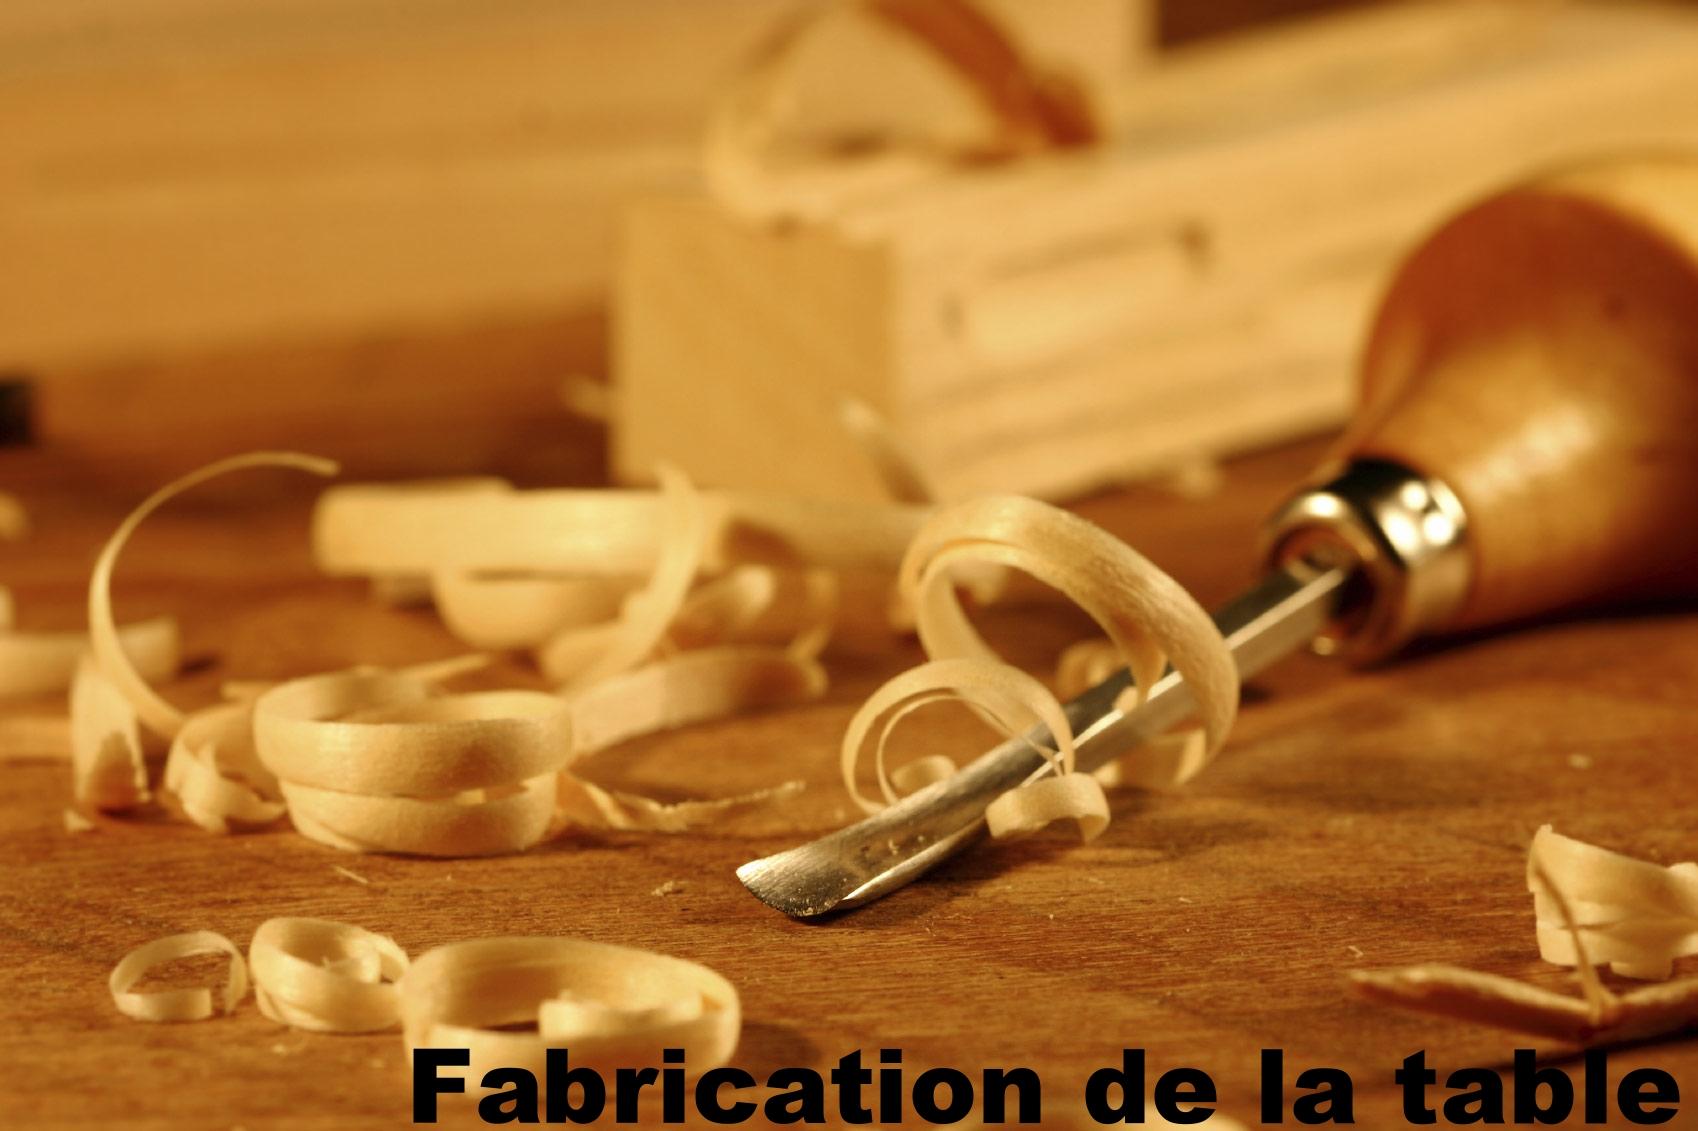 bg_woodworking.jpg